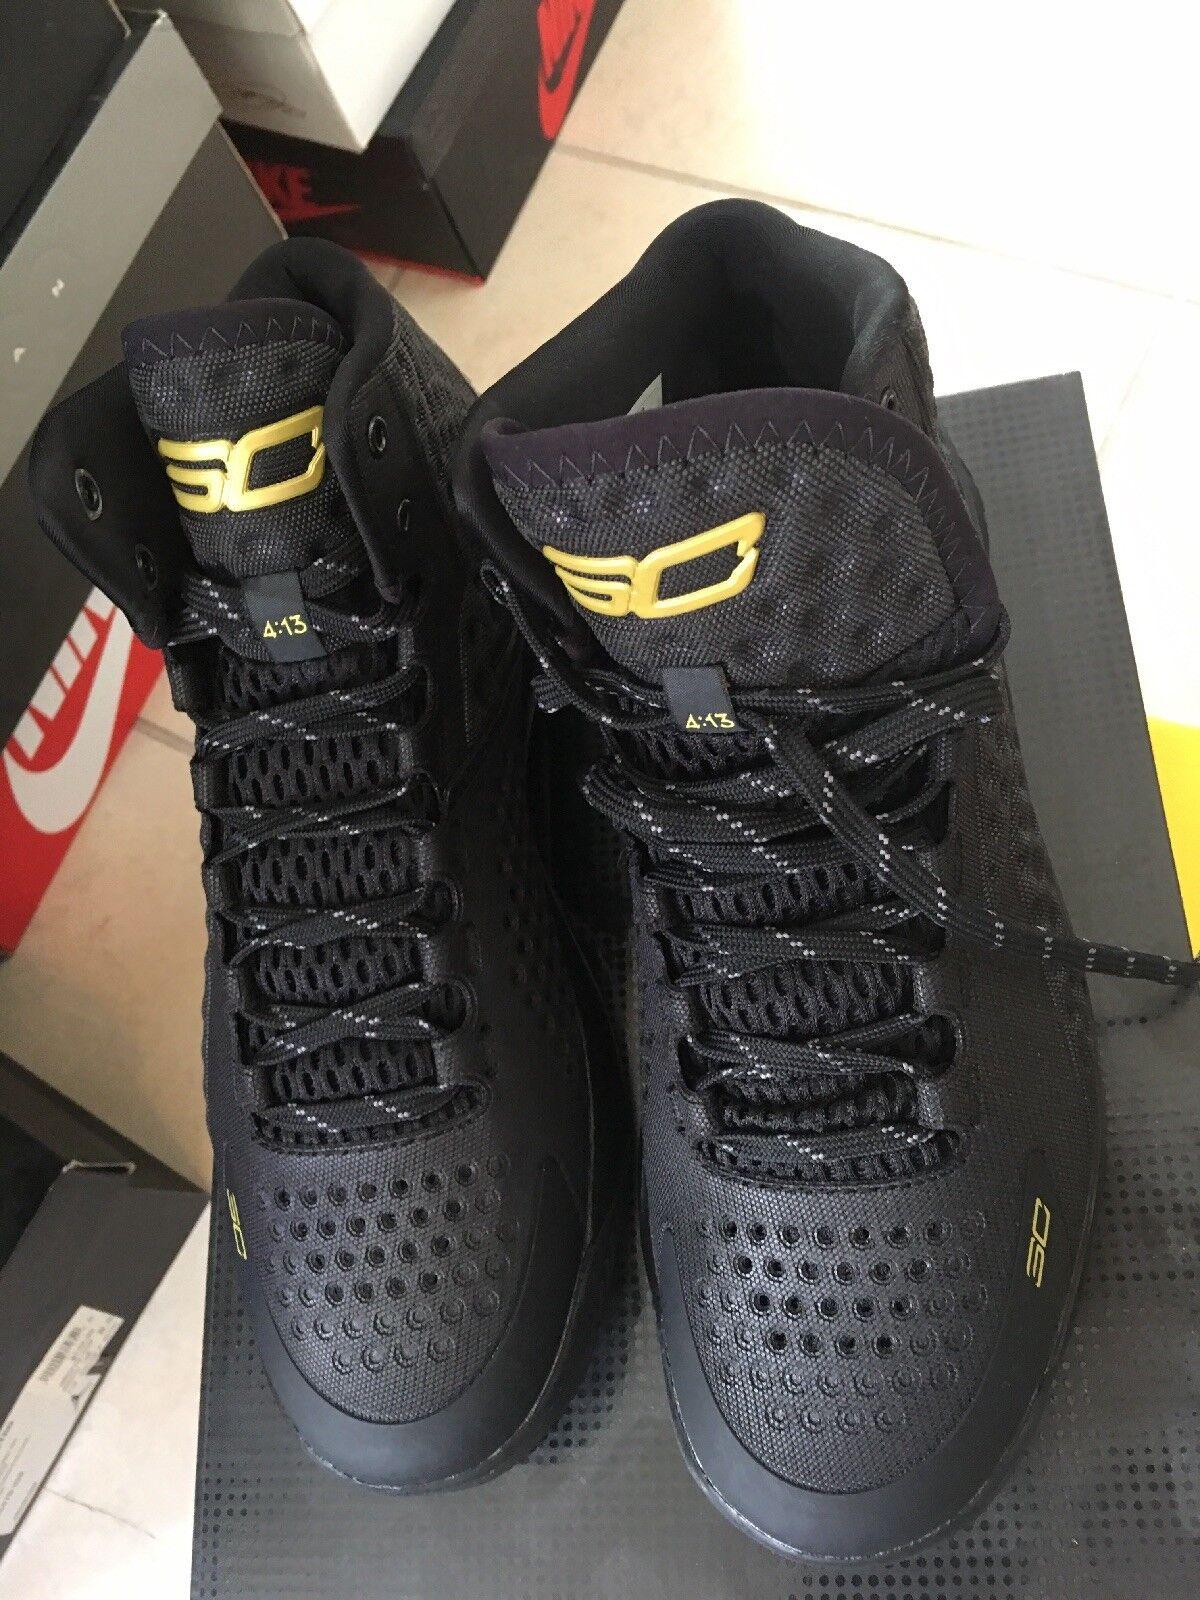 Men's Shoes Asics Gelburst 22 Ge Black Pink Glow Men Basketball Shoes Sneakers Tbf34g-9020 Fine Workmanship Athletic Shoes